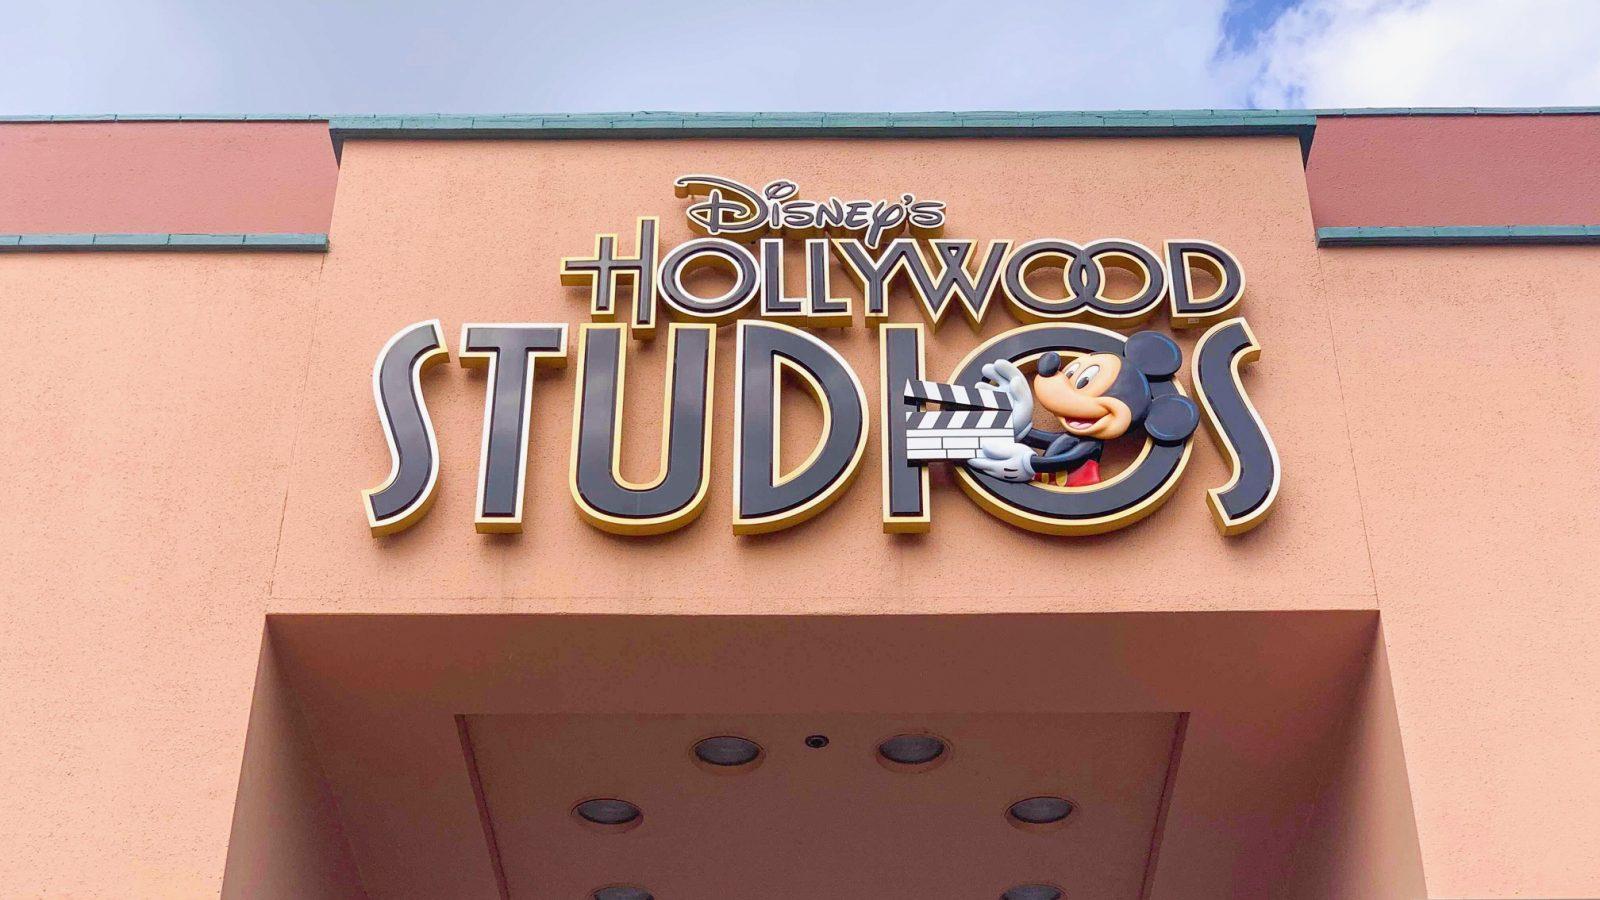 Hollywood Studios Fastpass Park Entrance